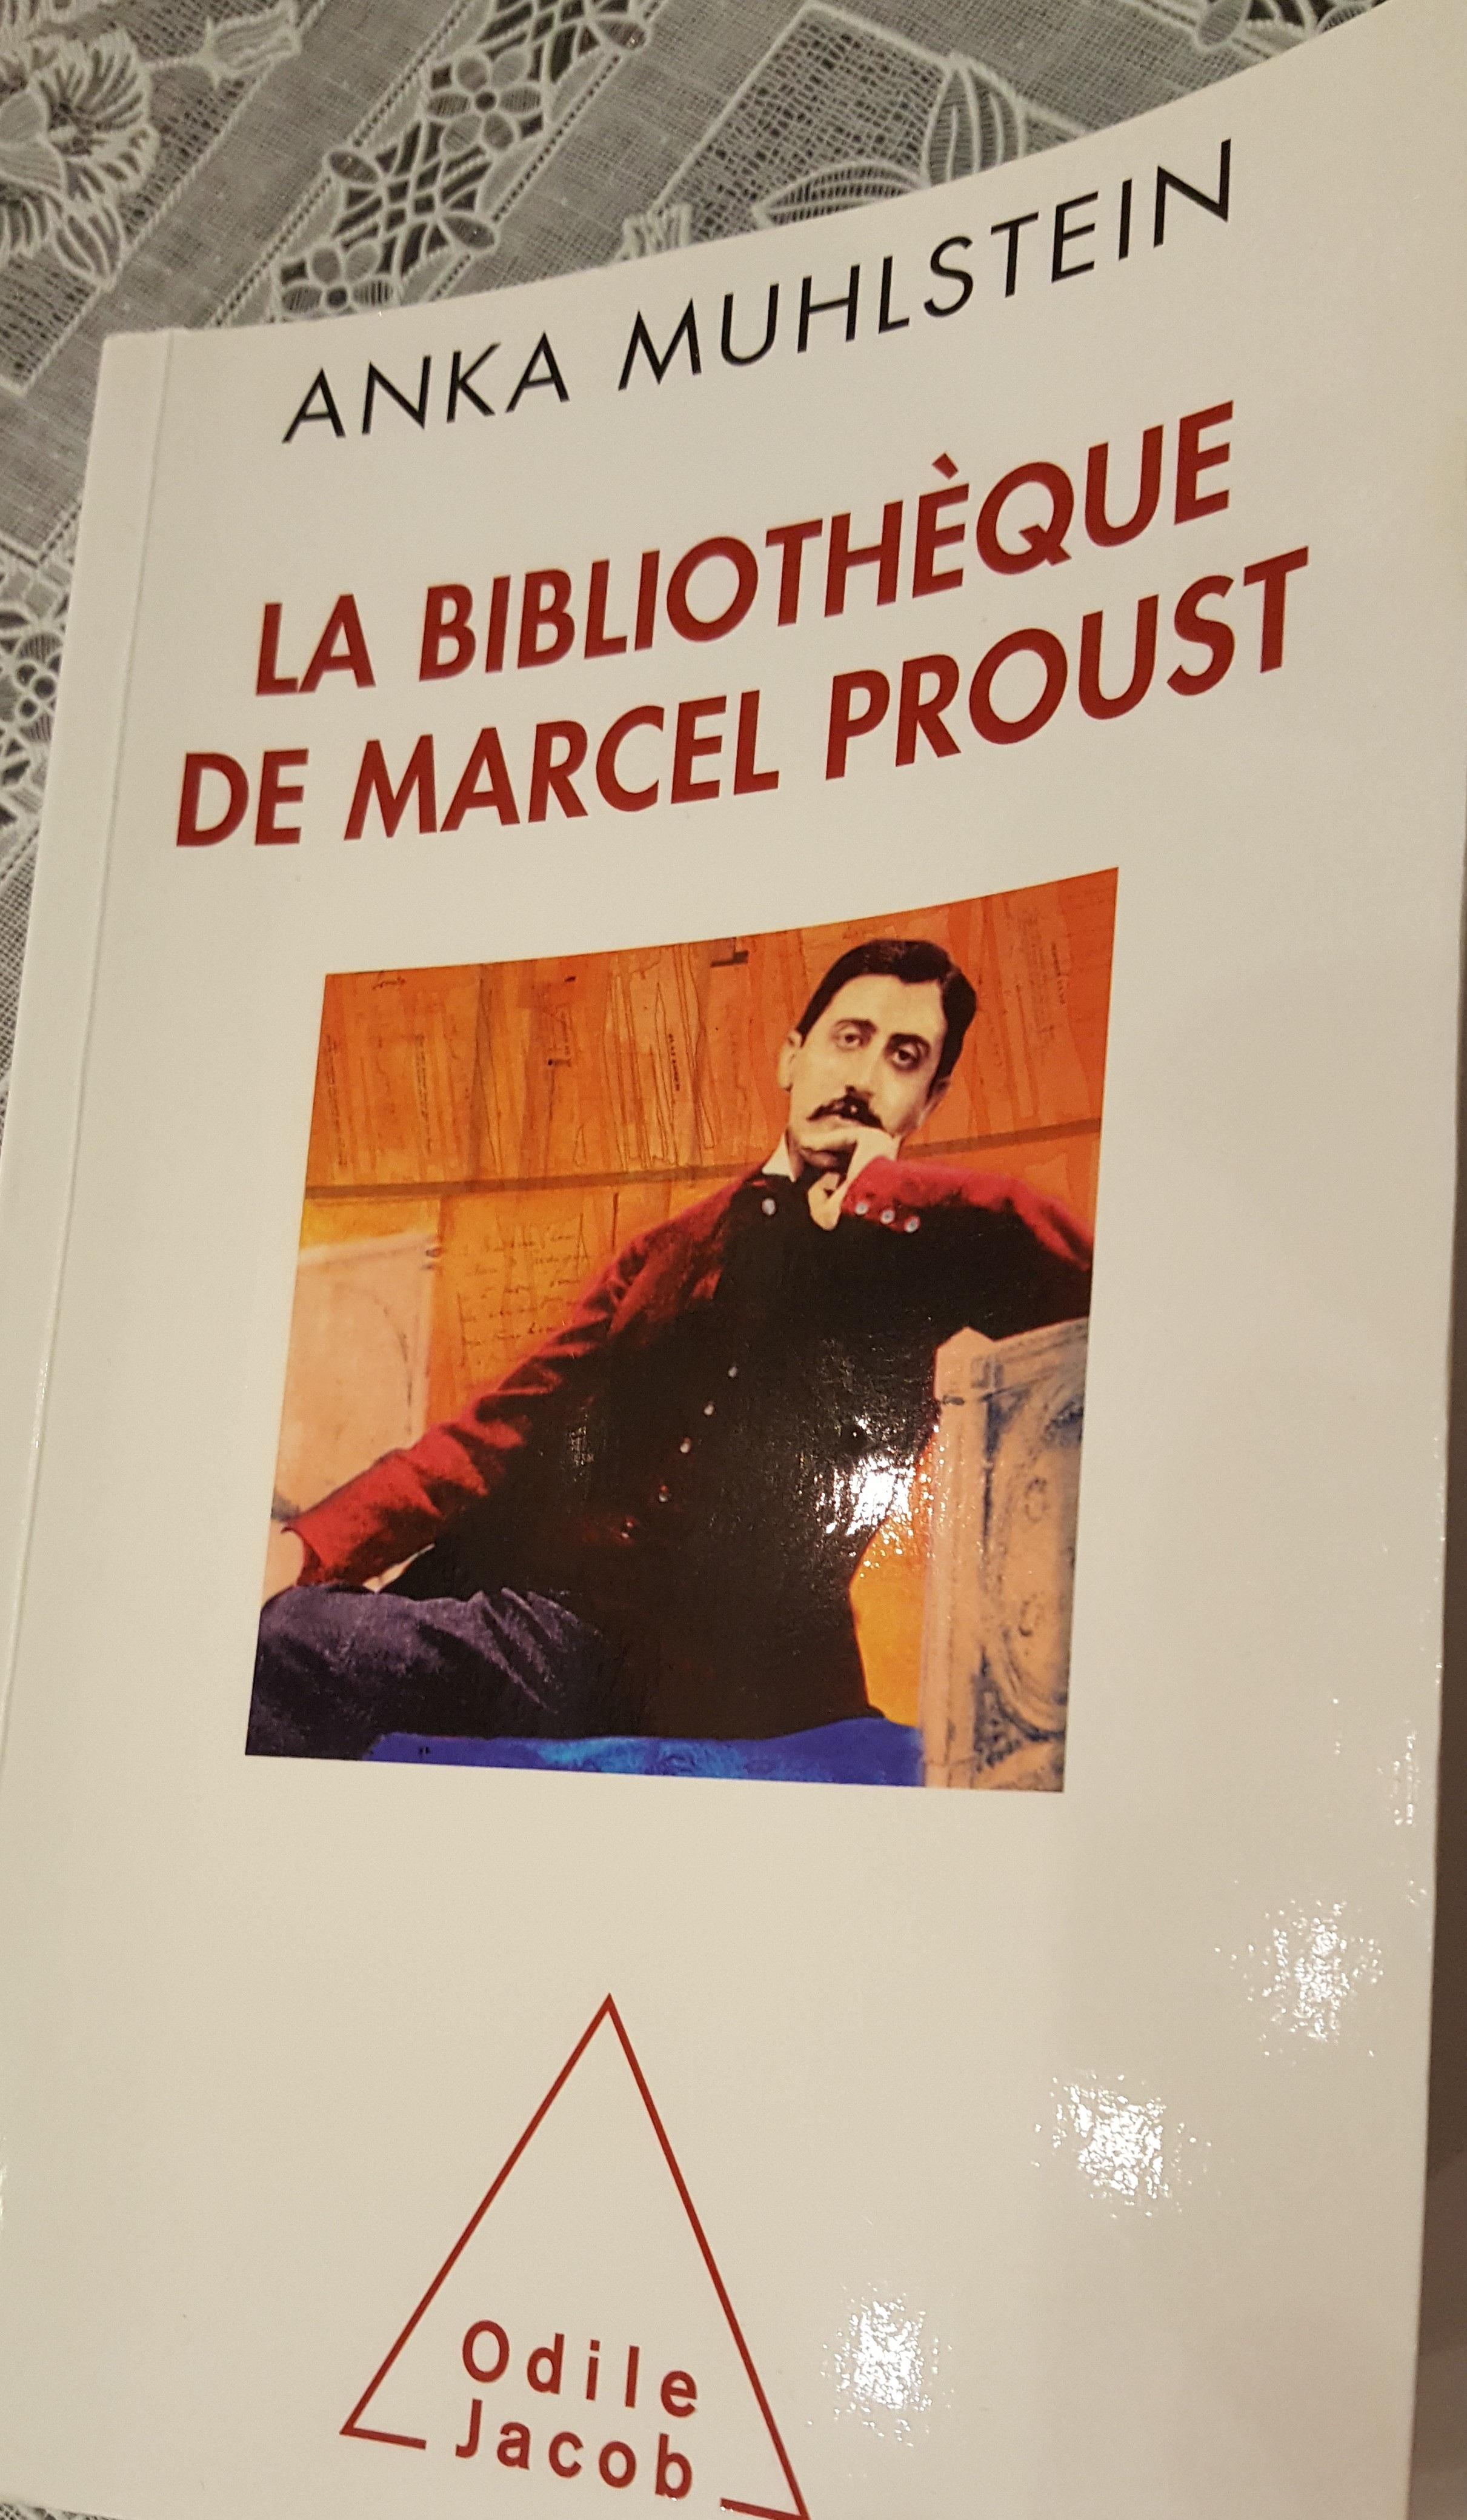 """La Bibliothèque de Marcel Proust"", de Anka Muhlstein"